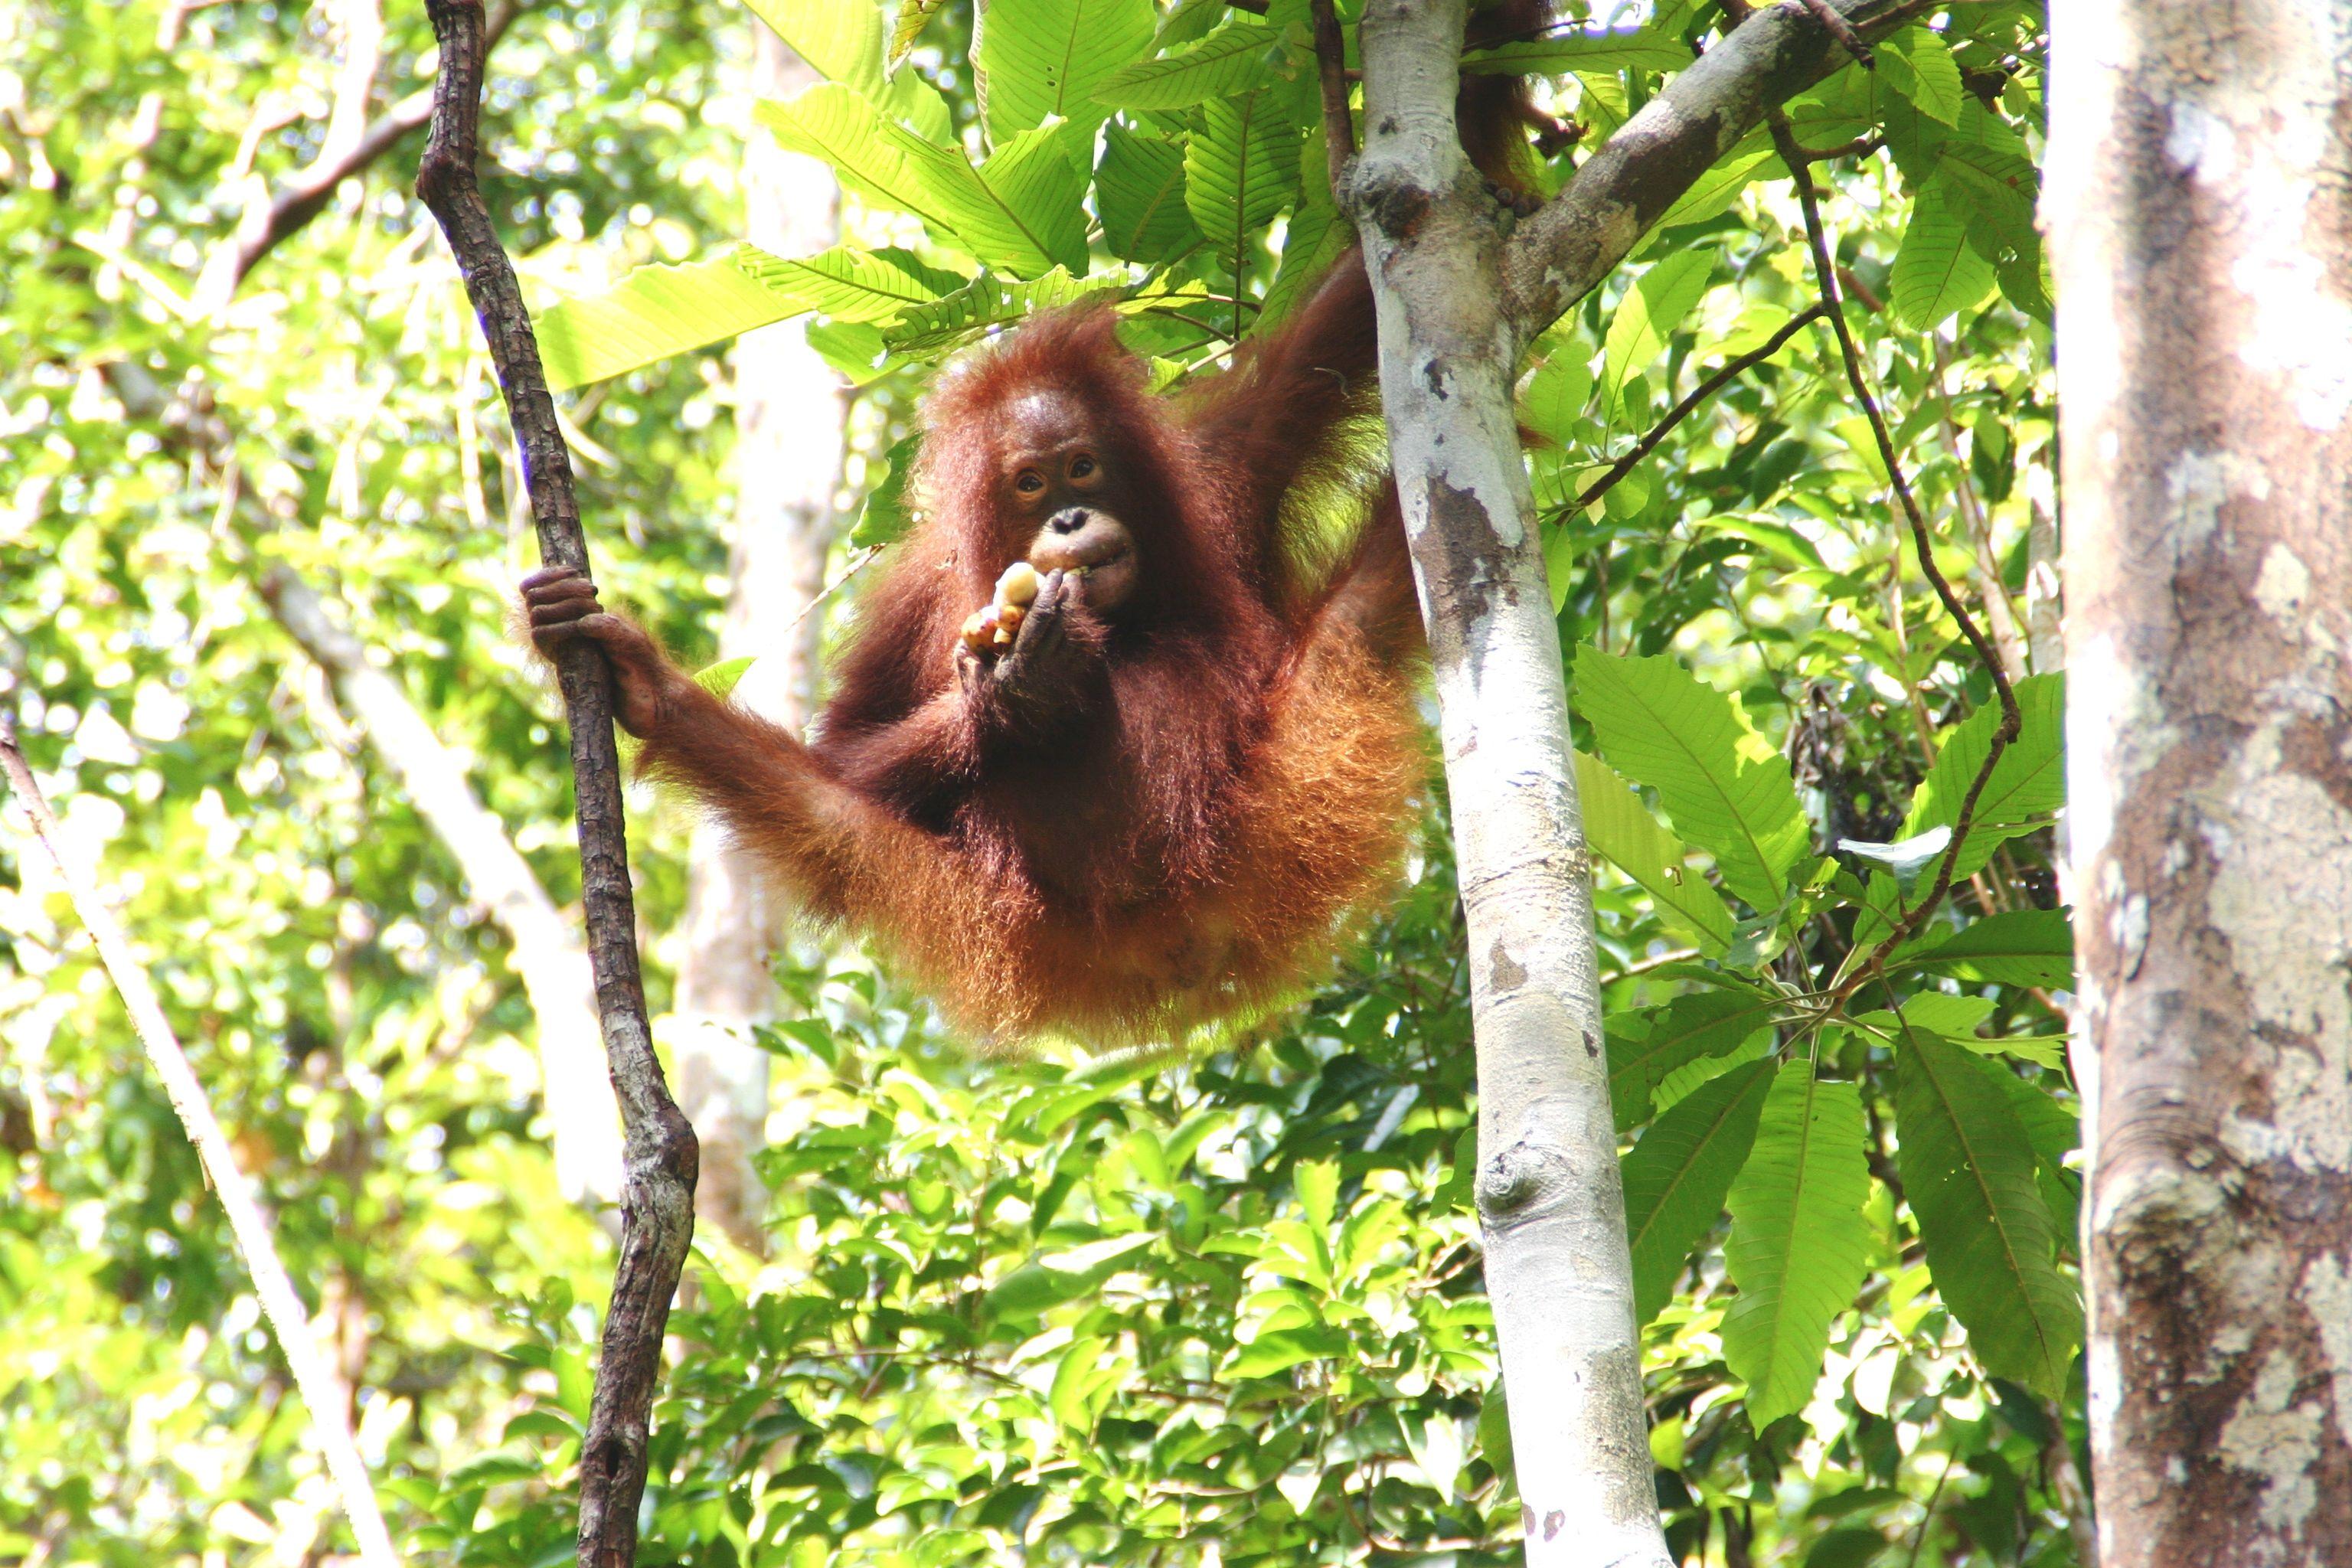 Tropical Rainforest Animals And Plants Pic Tropical Rainforest